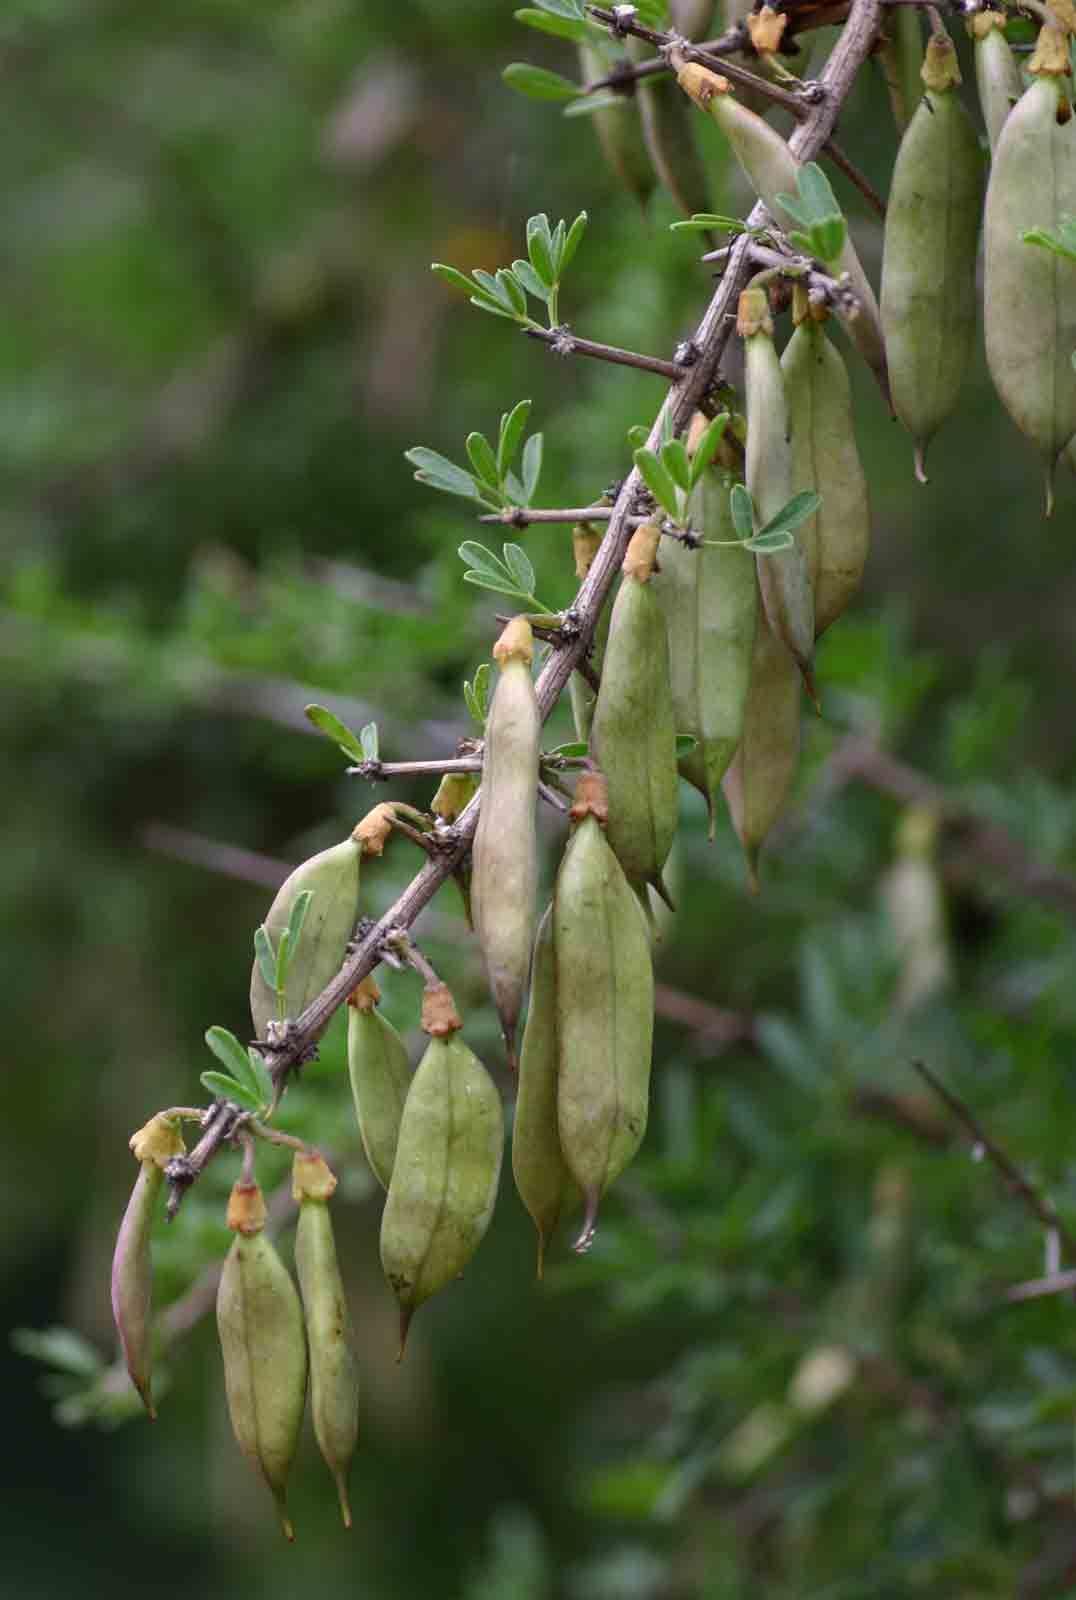 Rhigozum Obovatum Karoo Gold Geelberggranaat S A No 675 Zimbabweseedsflora Fruitplants